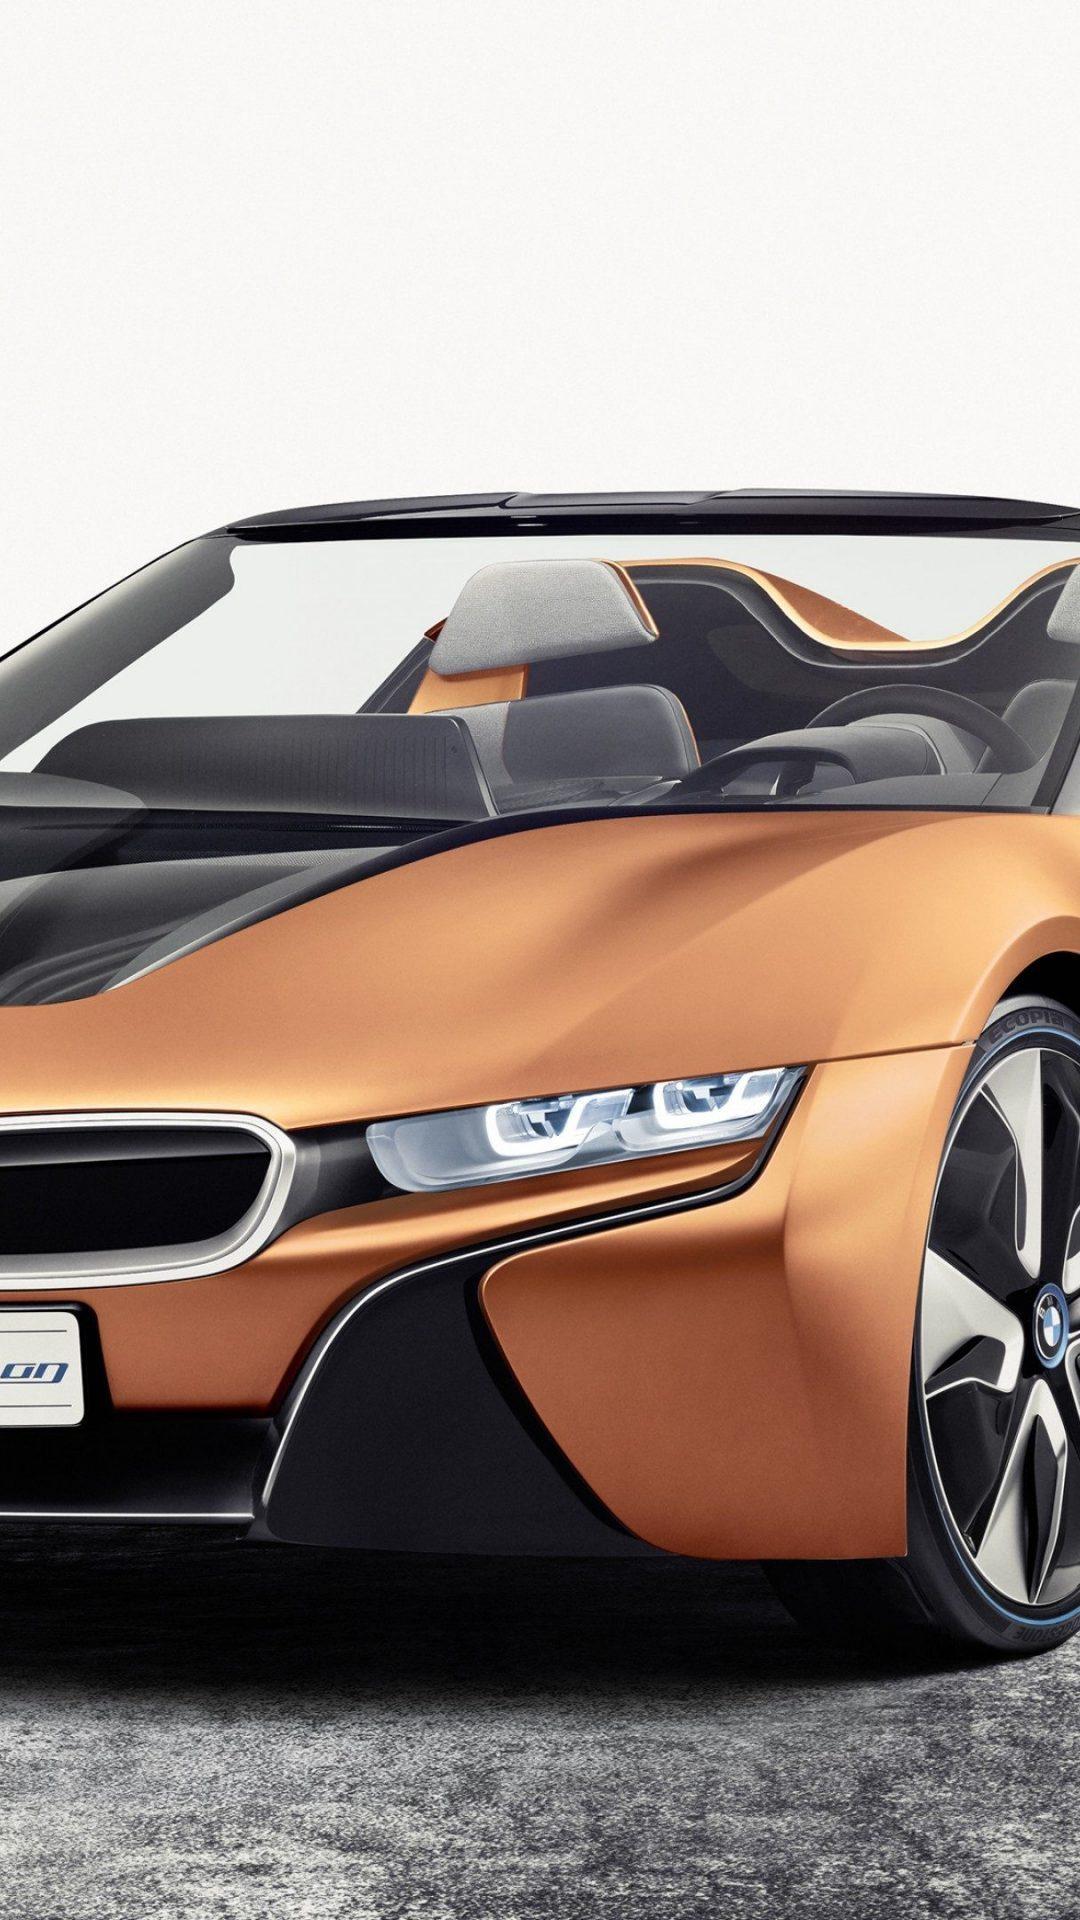 Download Bmw I8 Spyder Car Ultra Hd Wallpaper For Desktop - Bmw I Vision Future Interaction , HD Wallpaper & Backgrounds